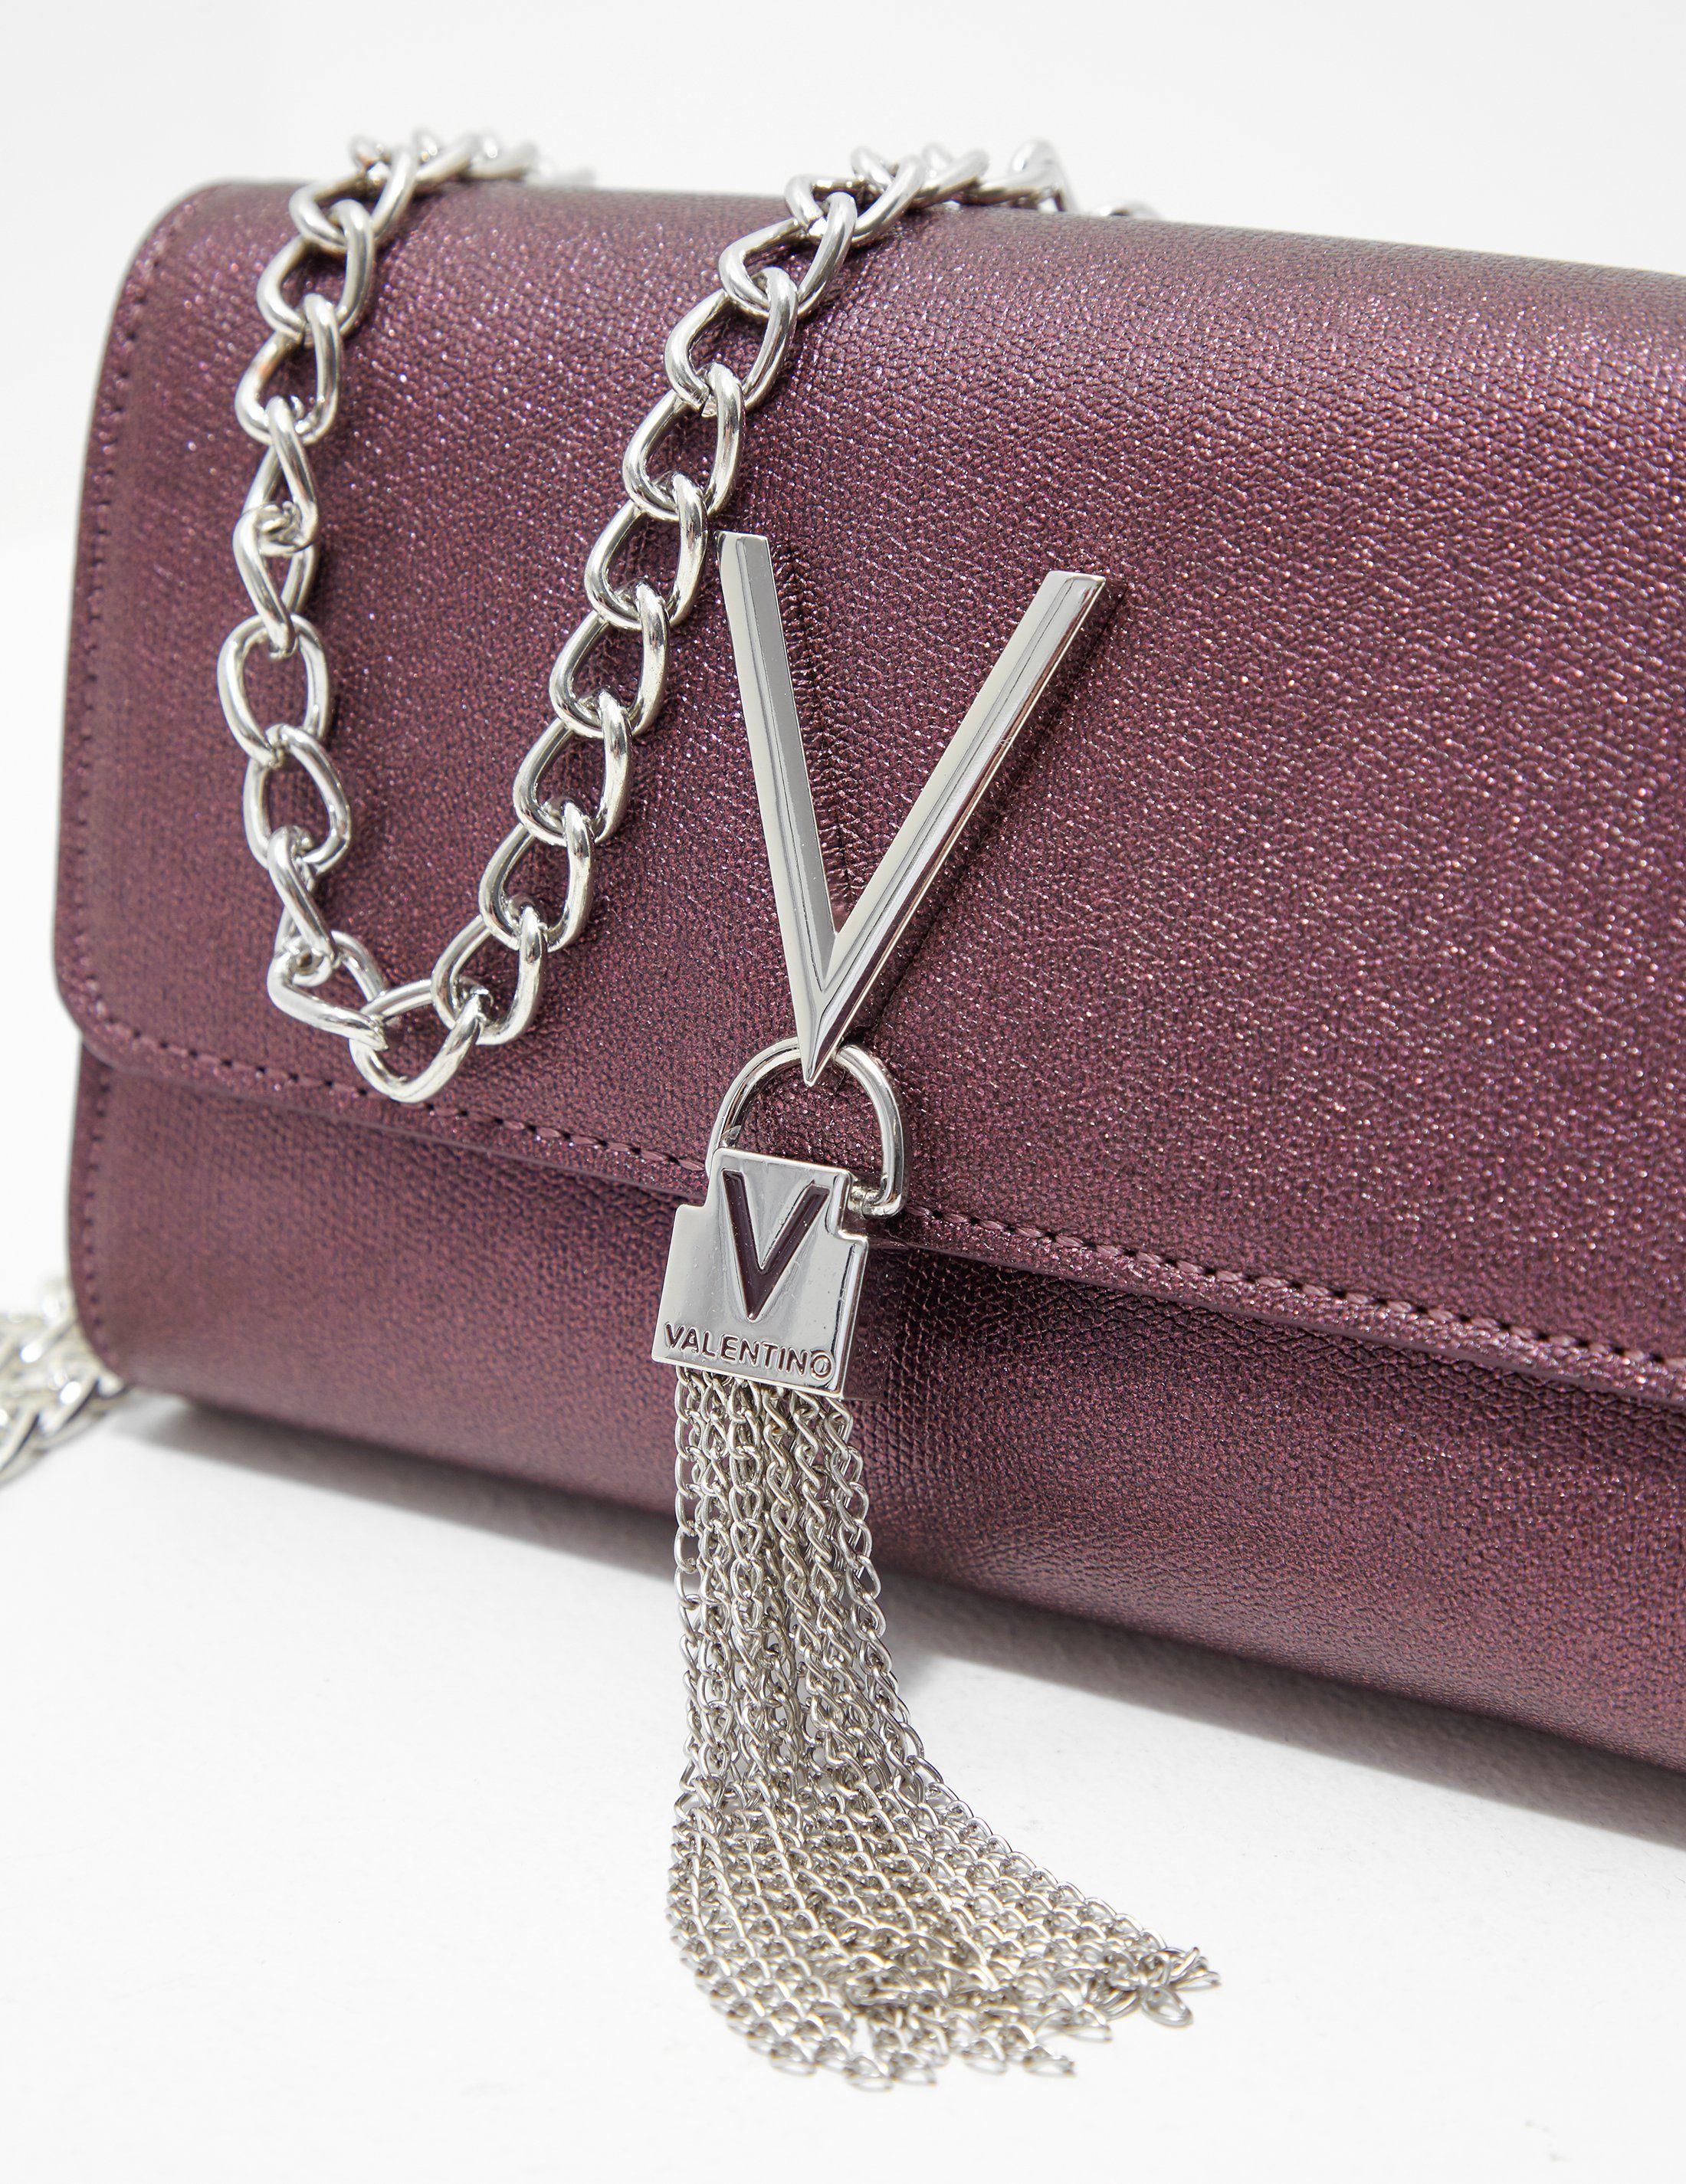 Valentino by Mario Valentino Marilyn Mini Shoulder Bag